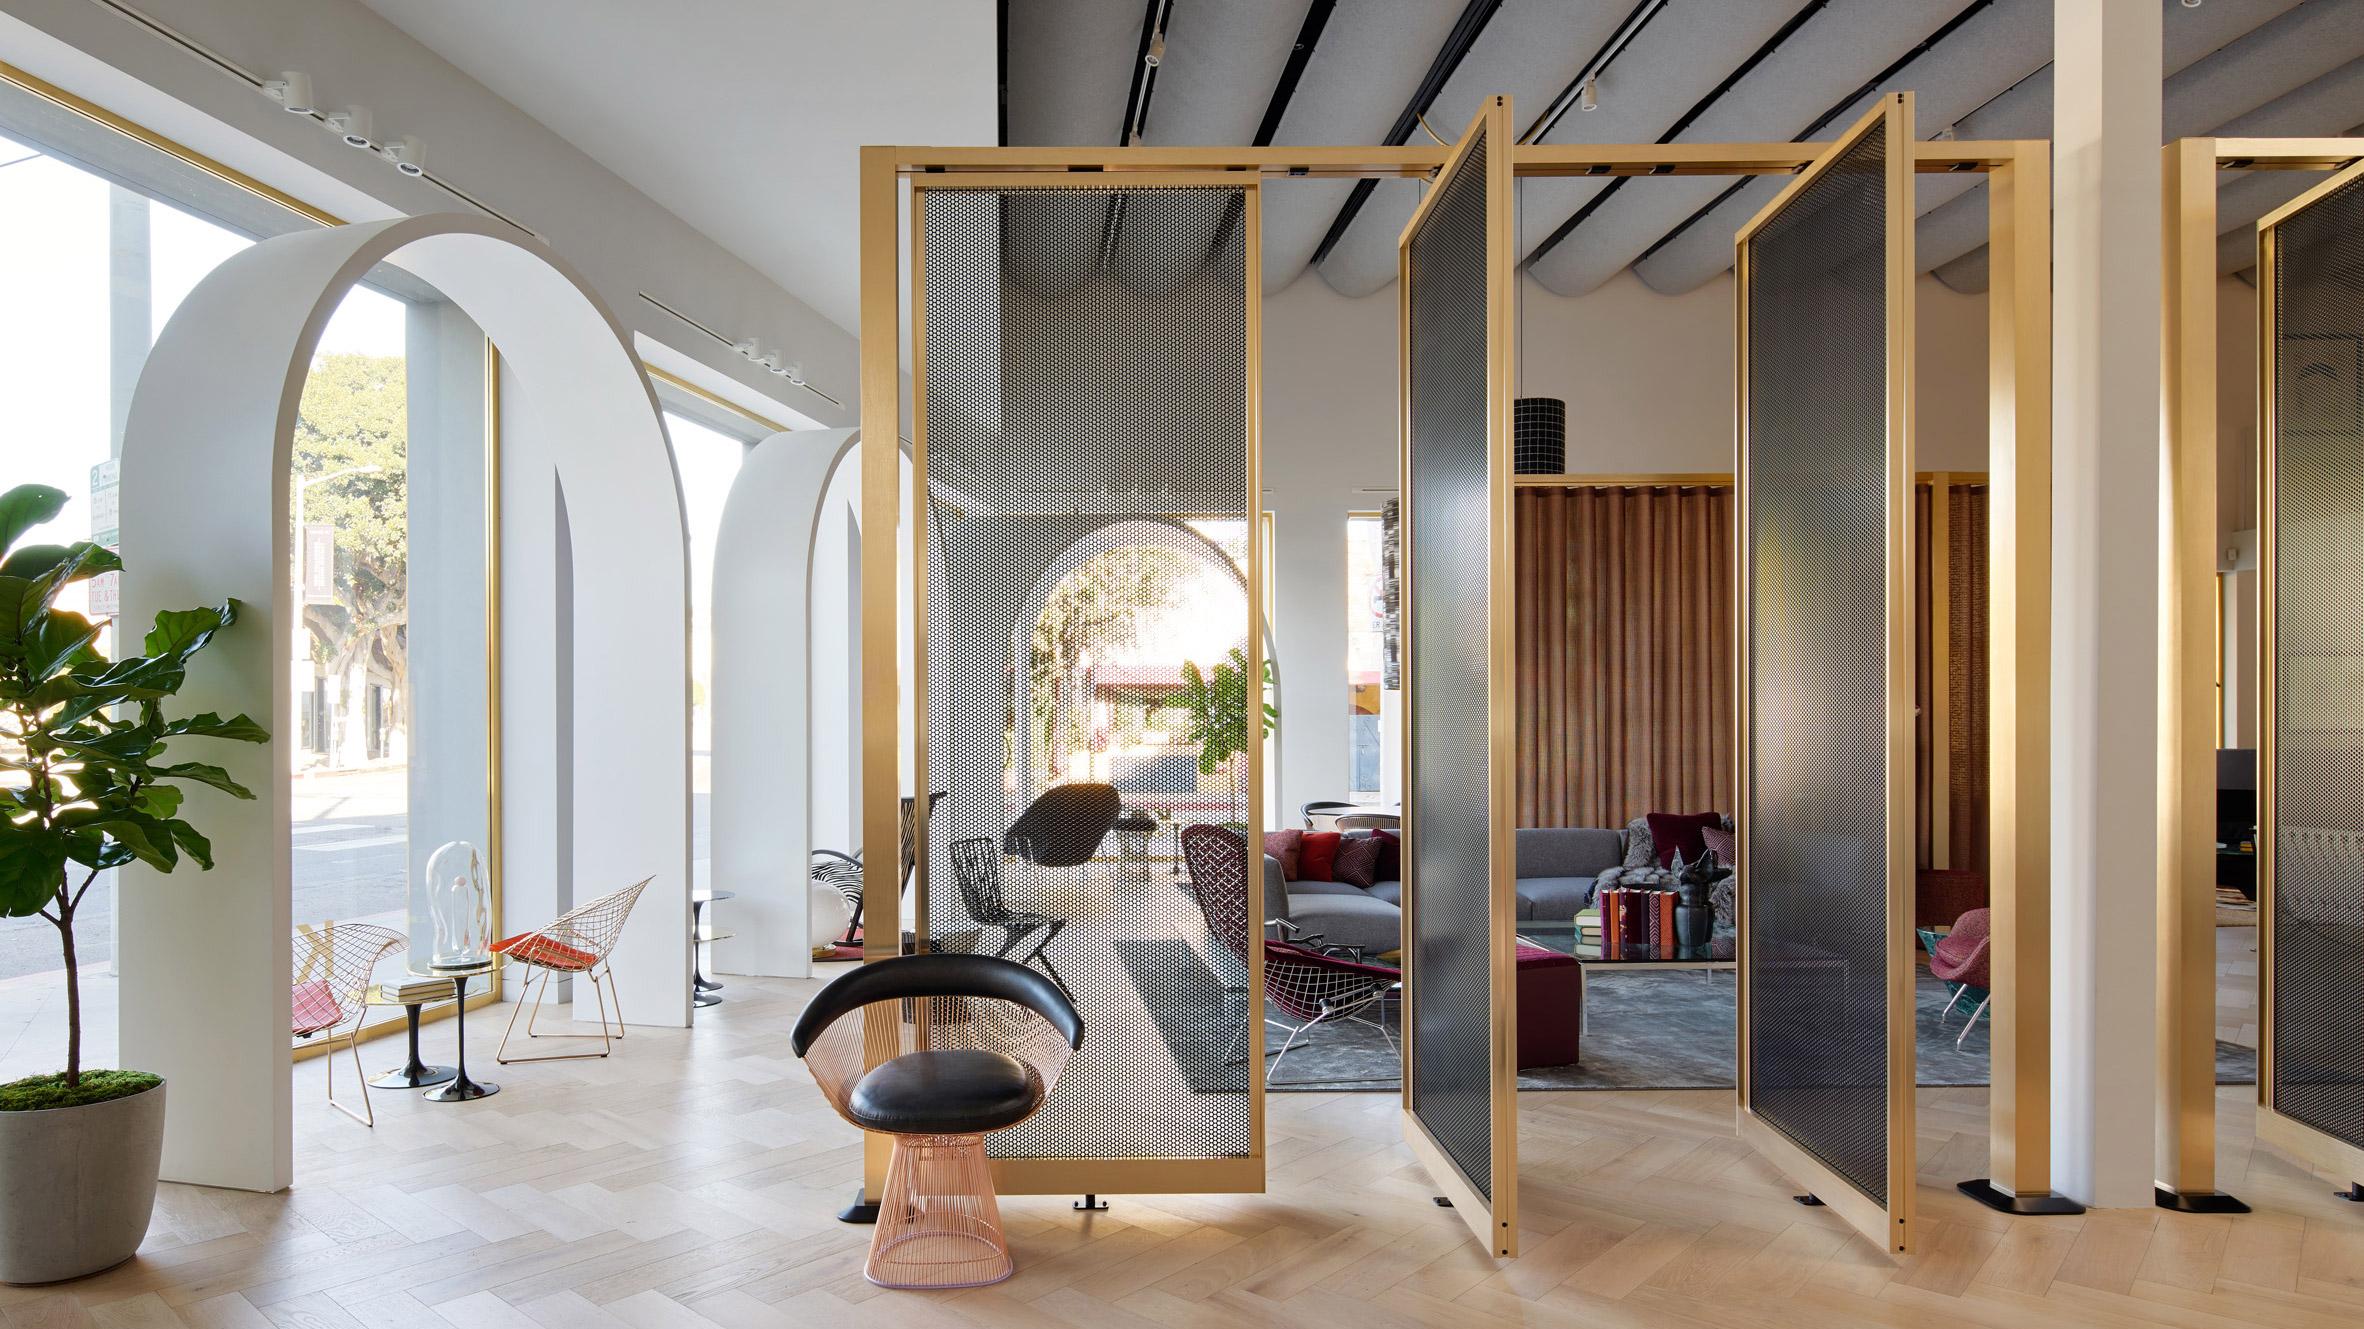 Dezeen's top shop interiors of 2018: Knoll LA by Johnston Marklee